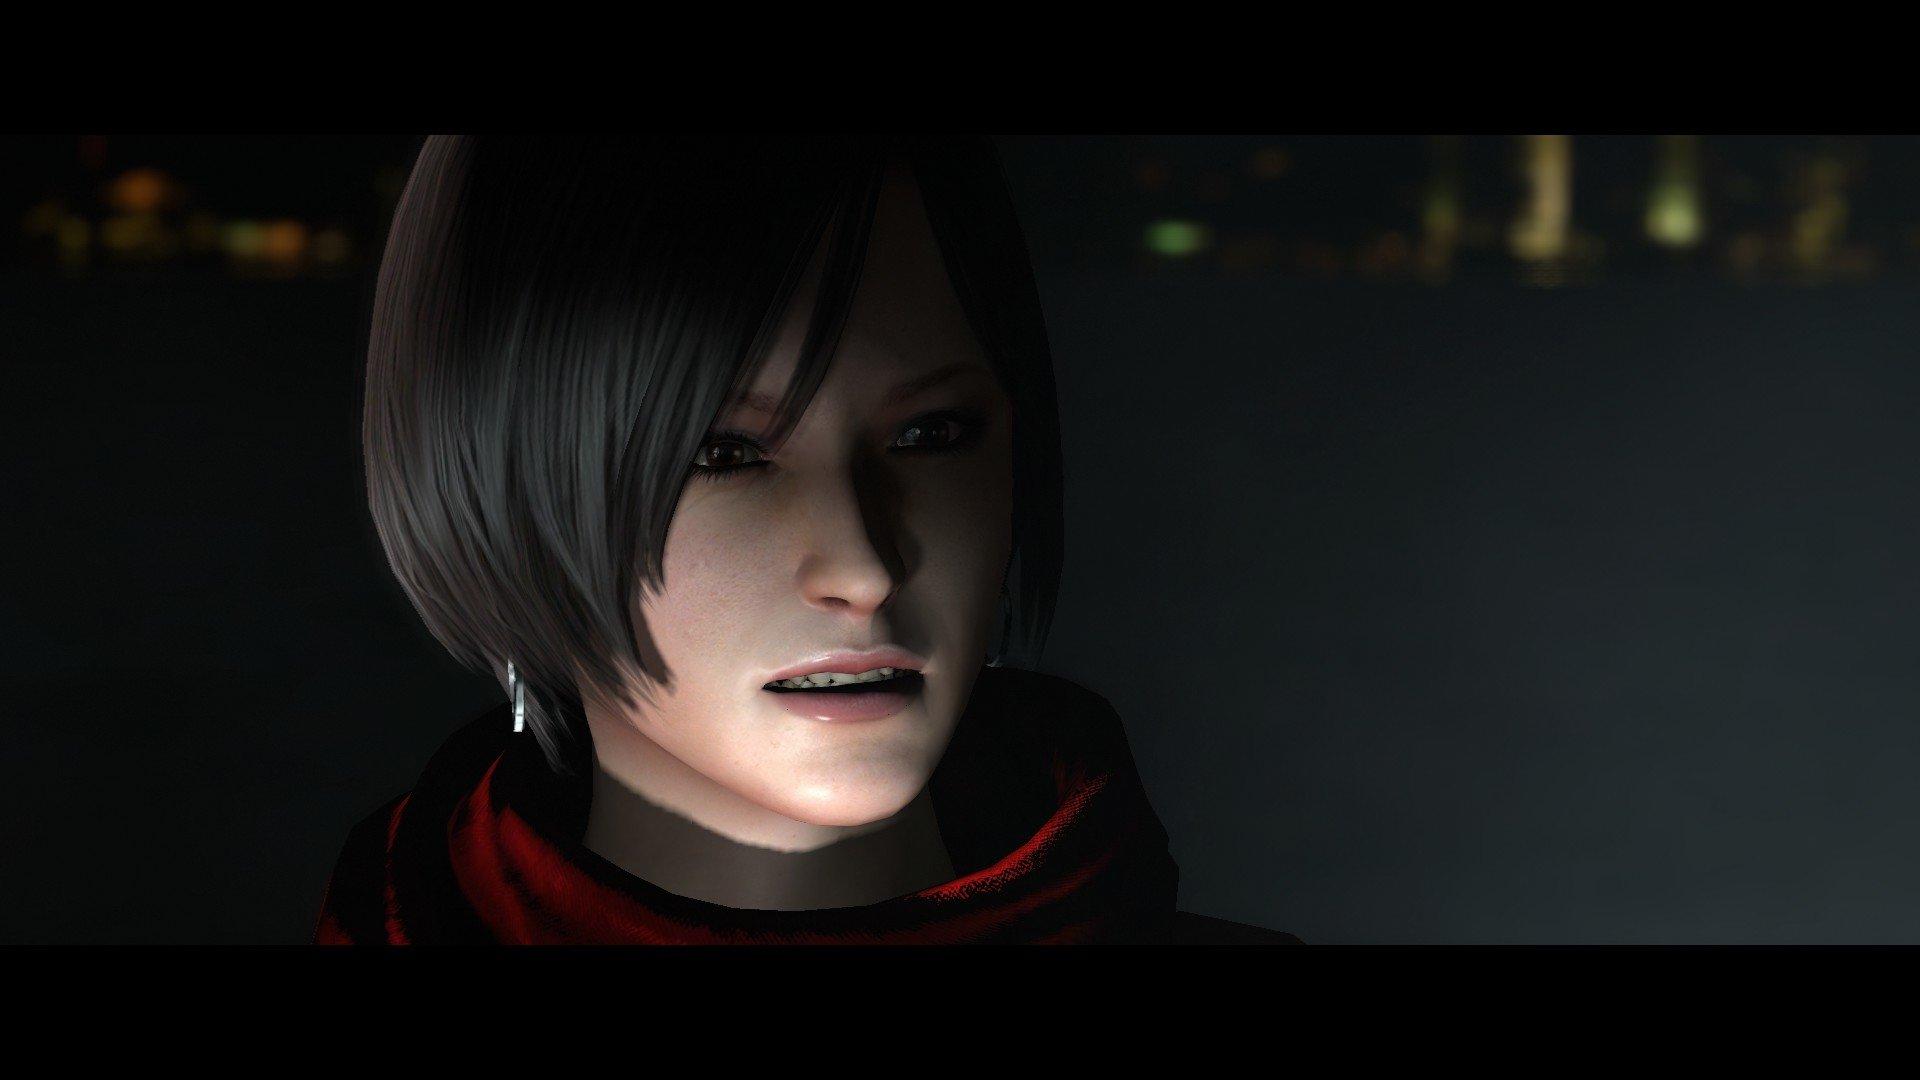 resident evil 6 ada wong face